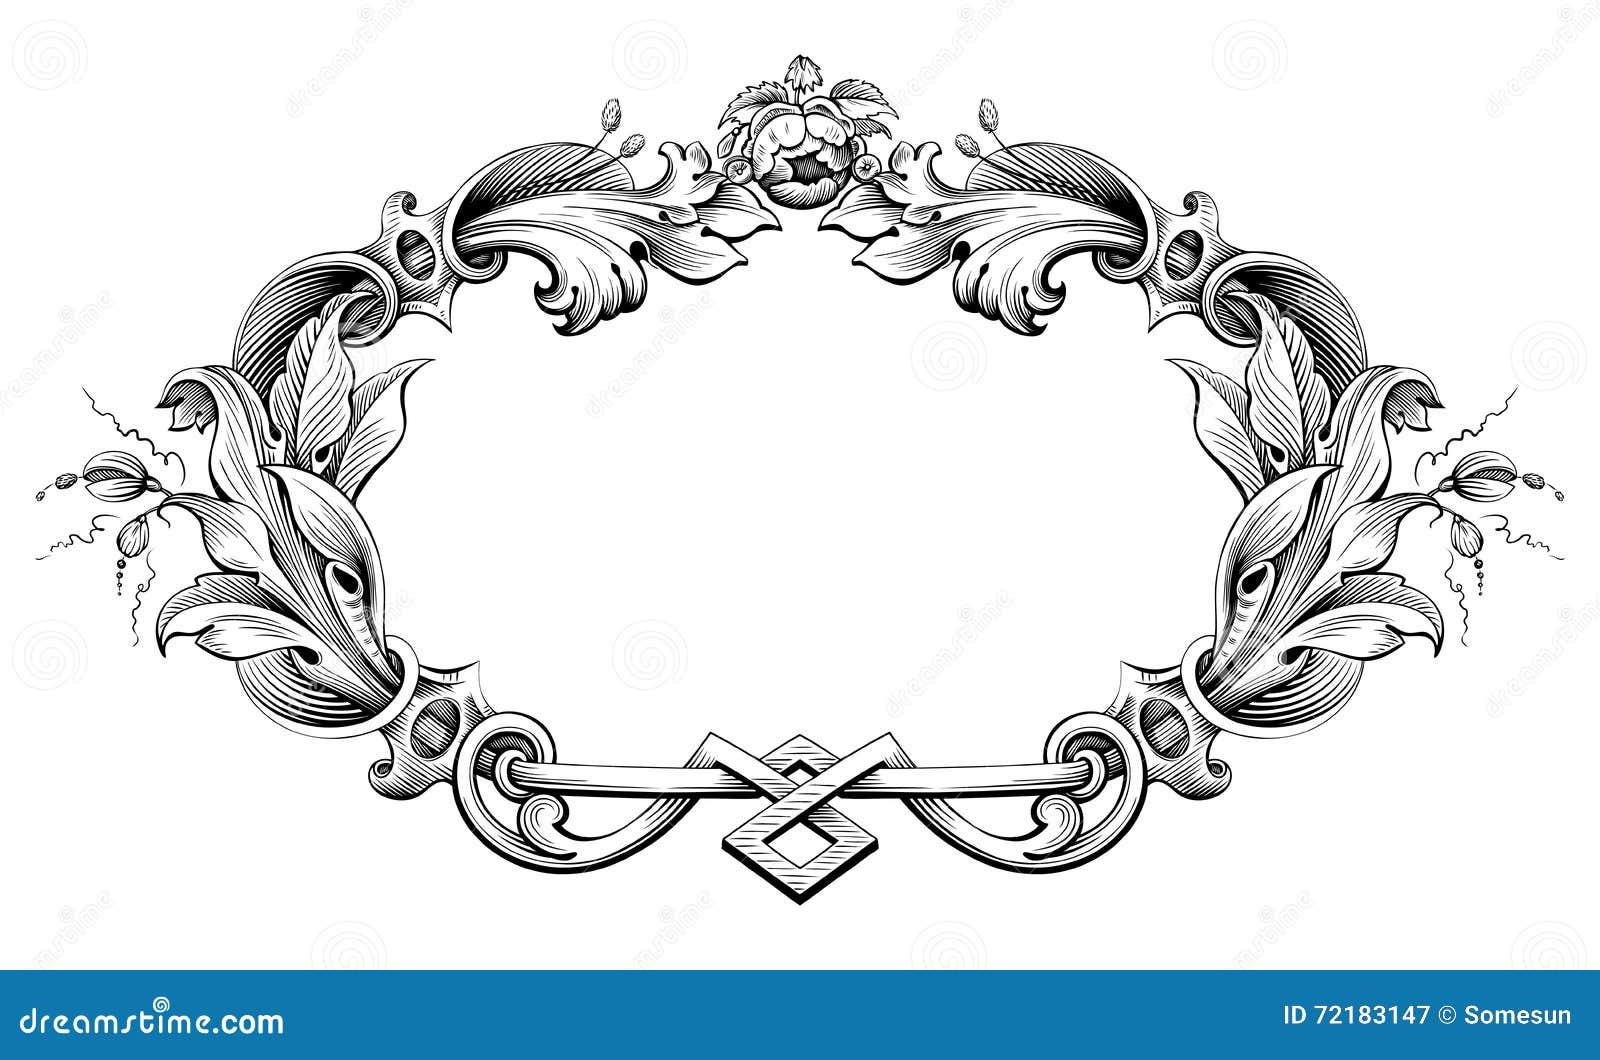 La voluta victoriana barroca del ornamento floral del monograma de la frontera del marco del vintage grabó el tatuaje retro del m